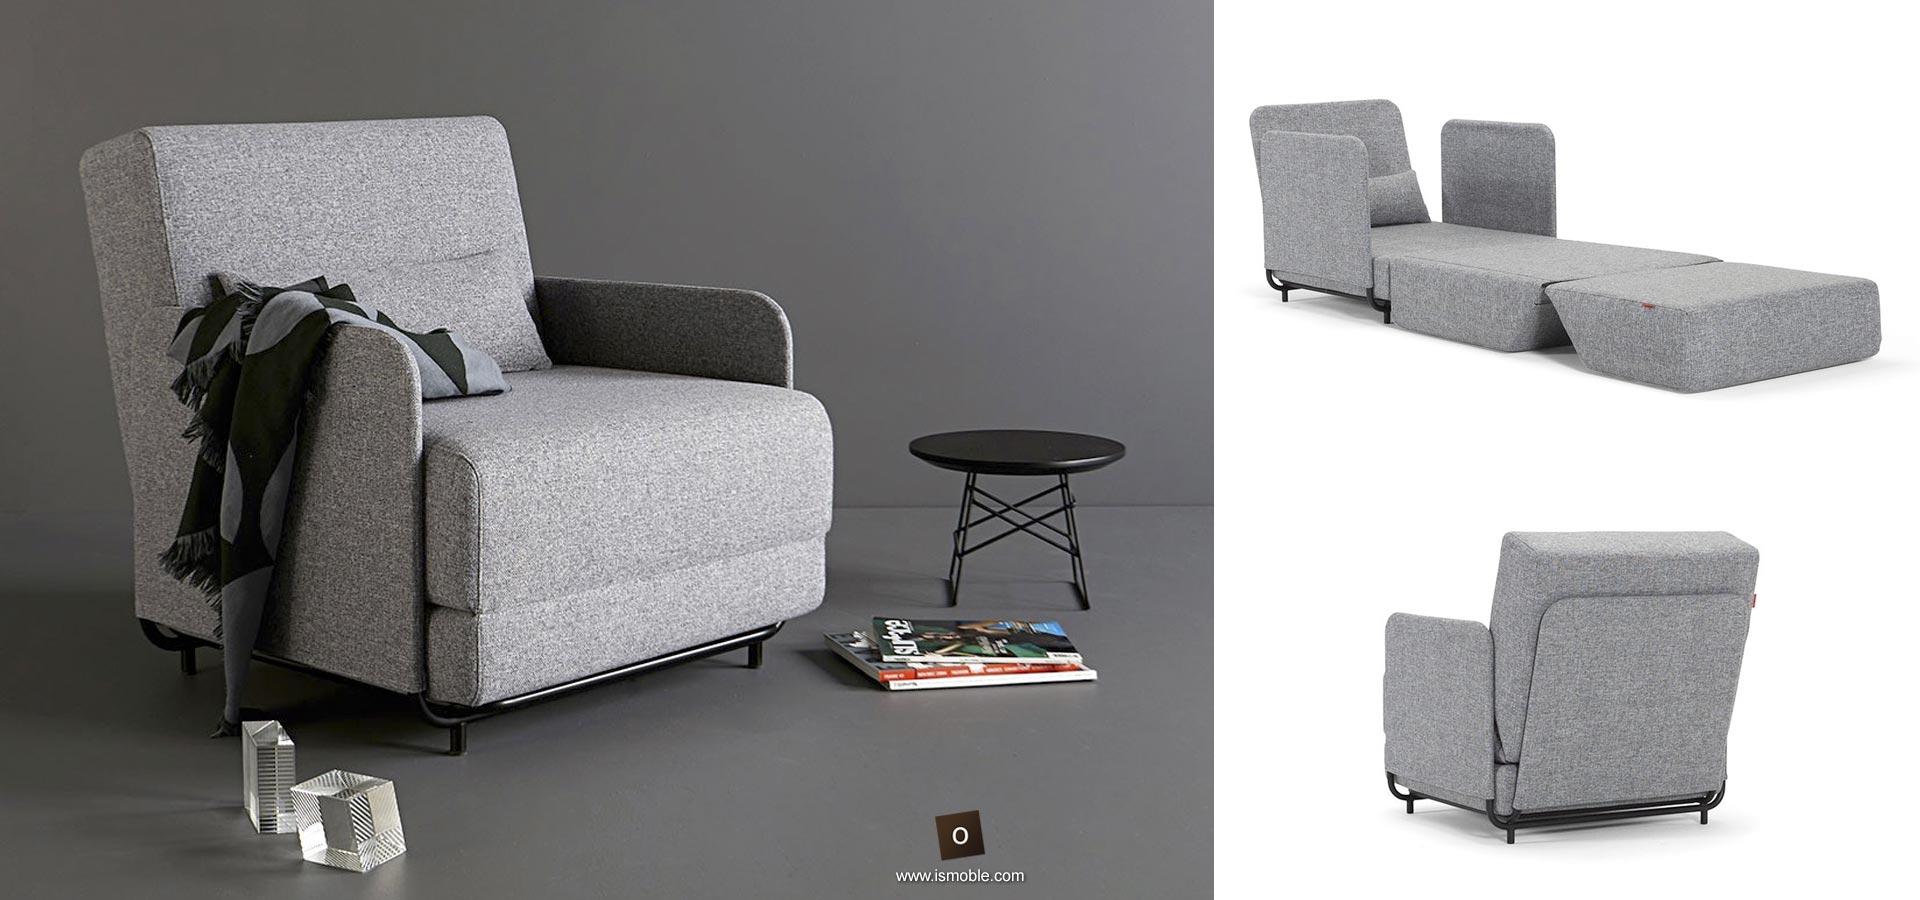 Butaca cama individual affordable amazing sof cama ikea for Sofa cama individual plegable